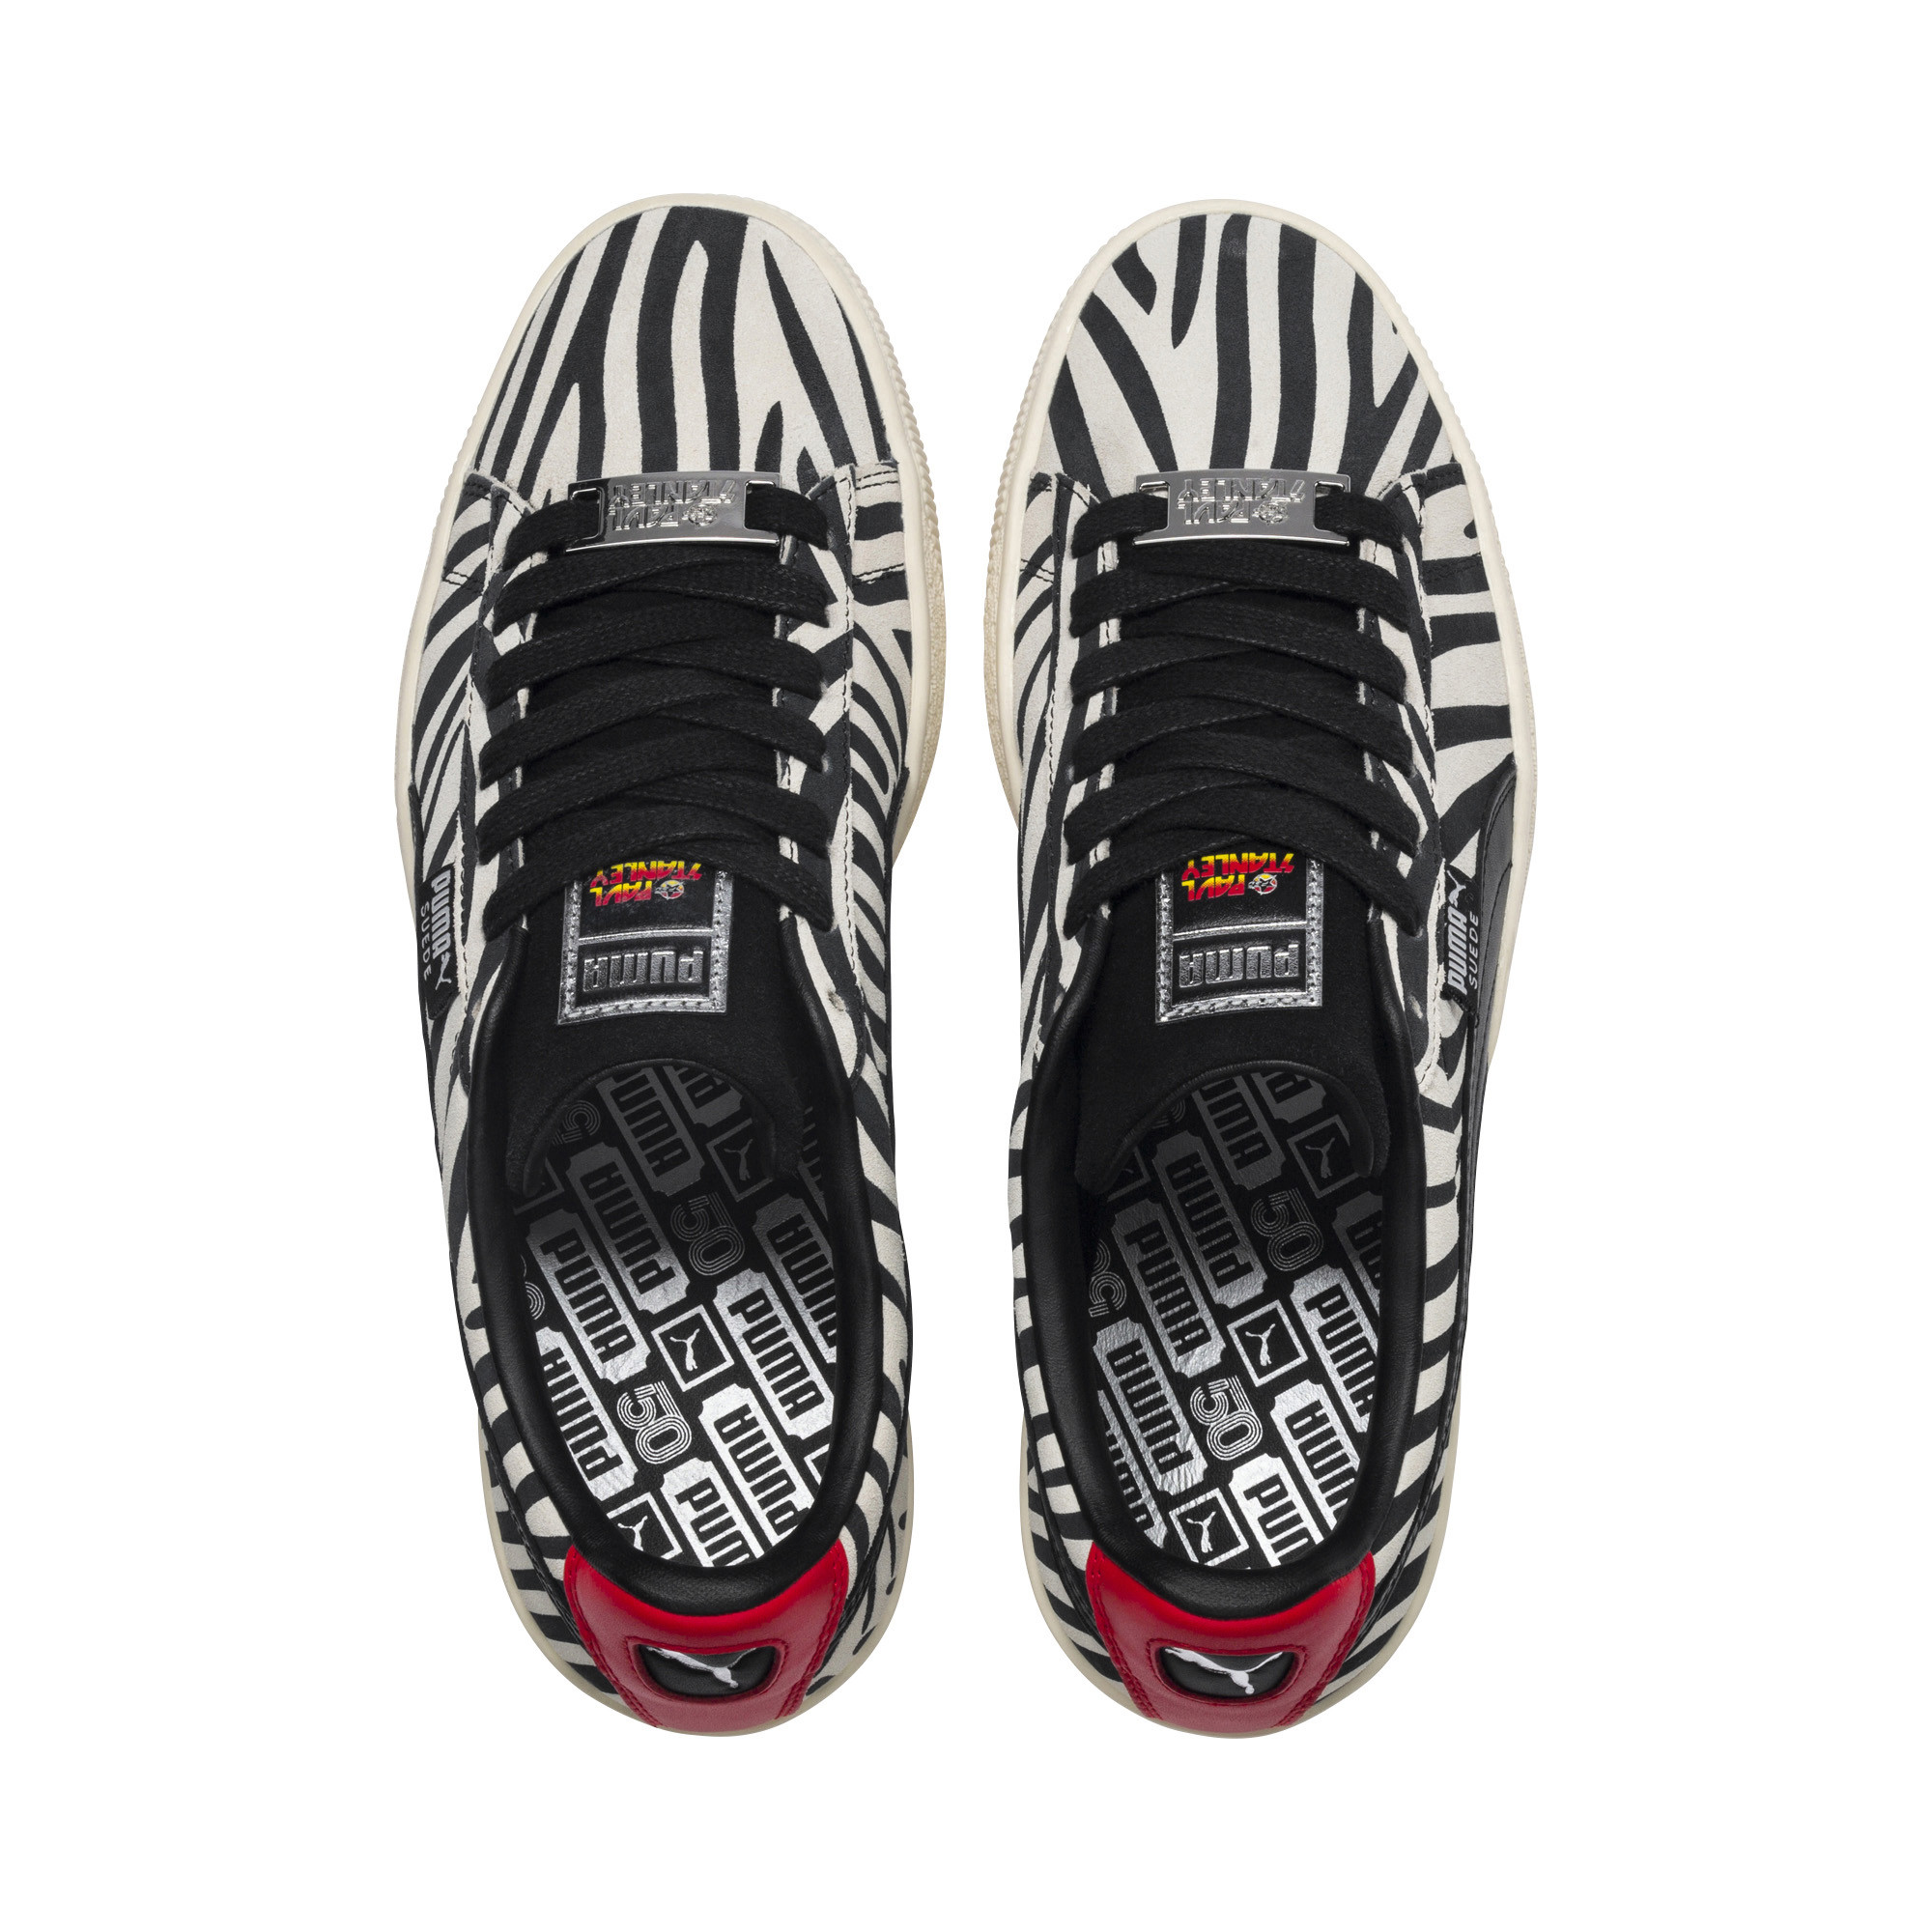 brand new 9f296 fe590 Details about PUMA PUMA x Paul Stanley Suede Men's Sneakers Men Shoe